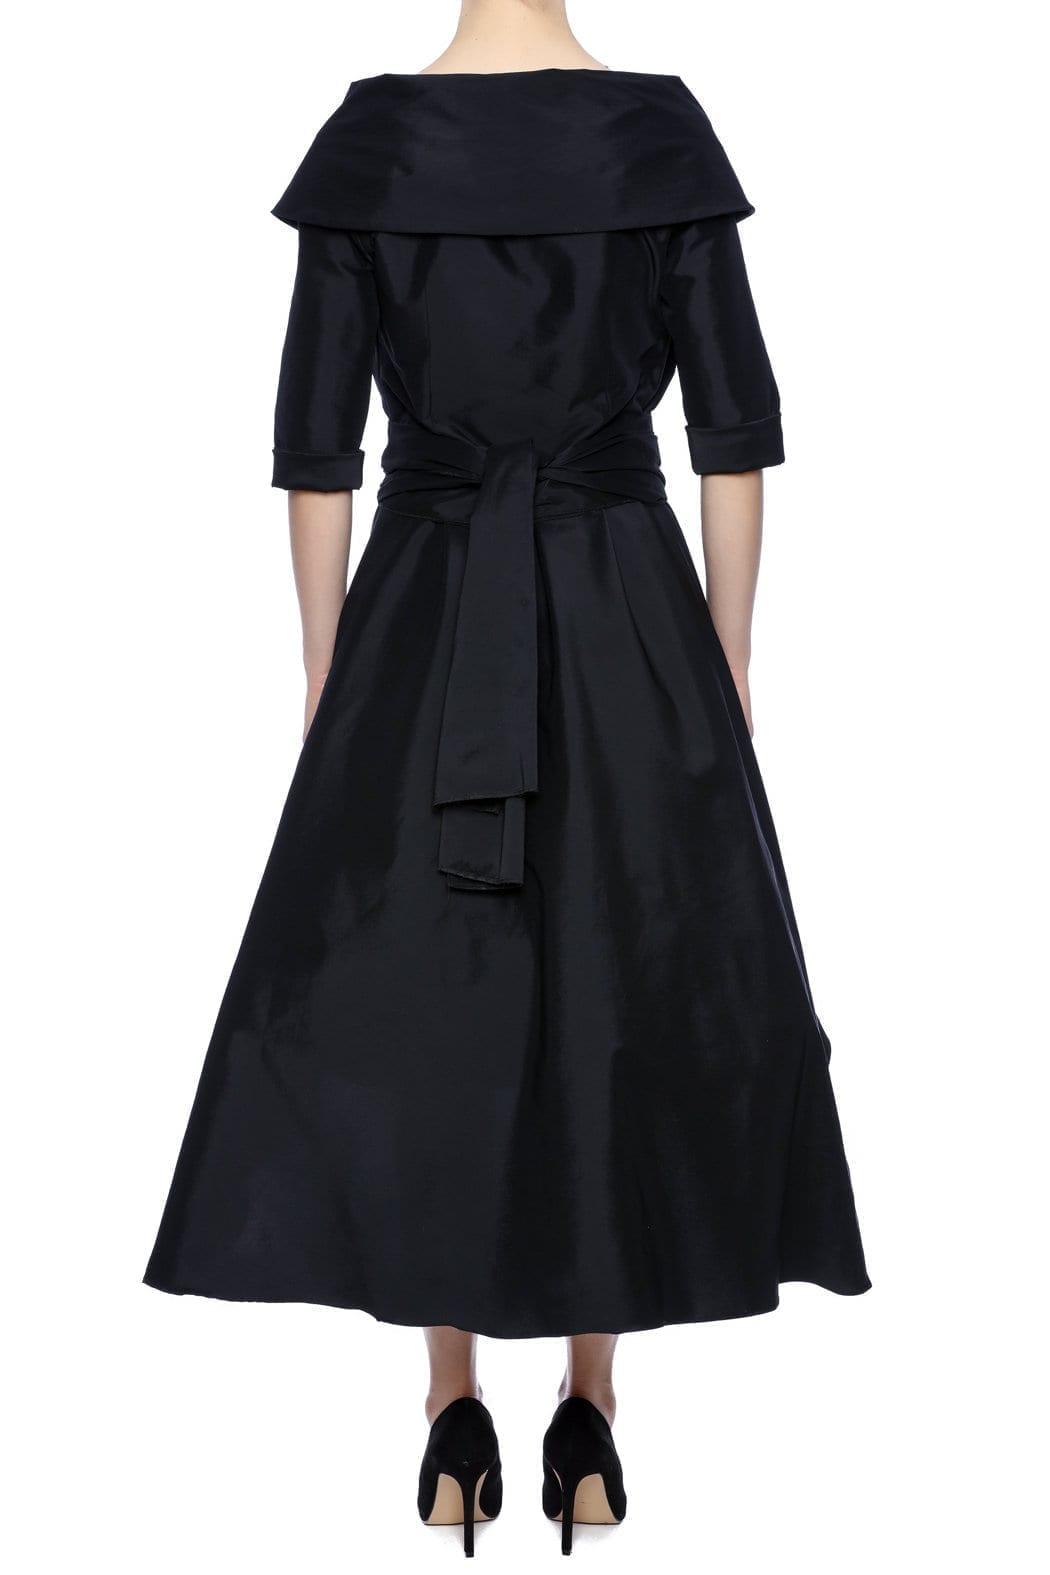 ATELIER Taffeta Portrait Collar Black Dress